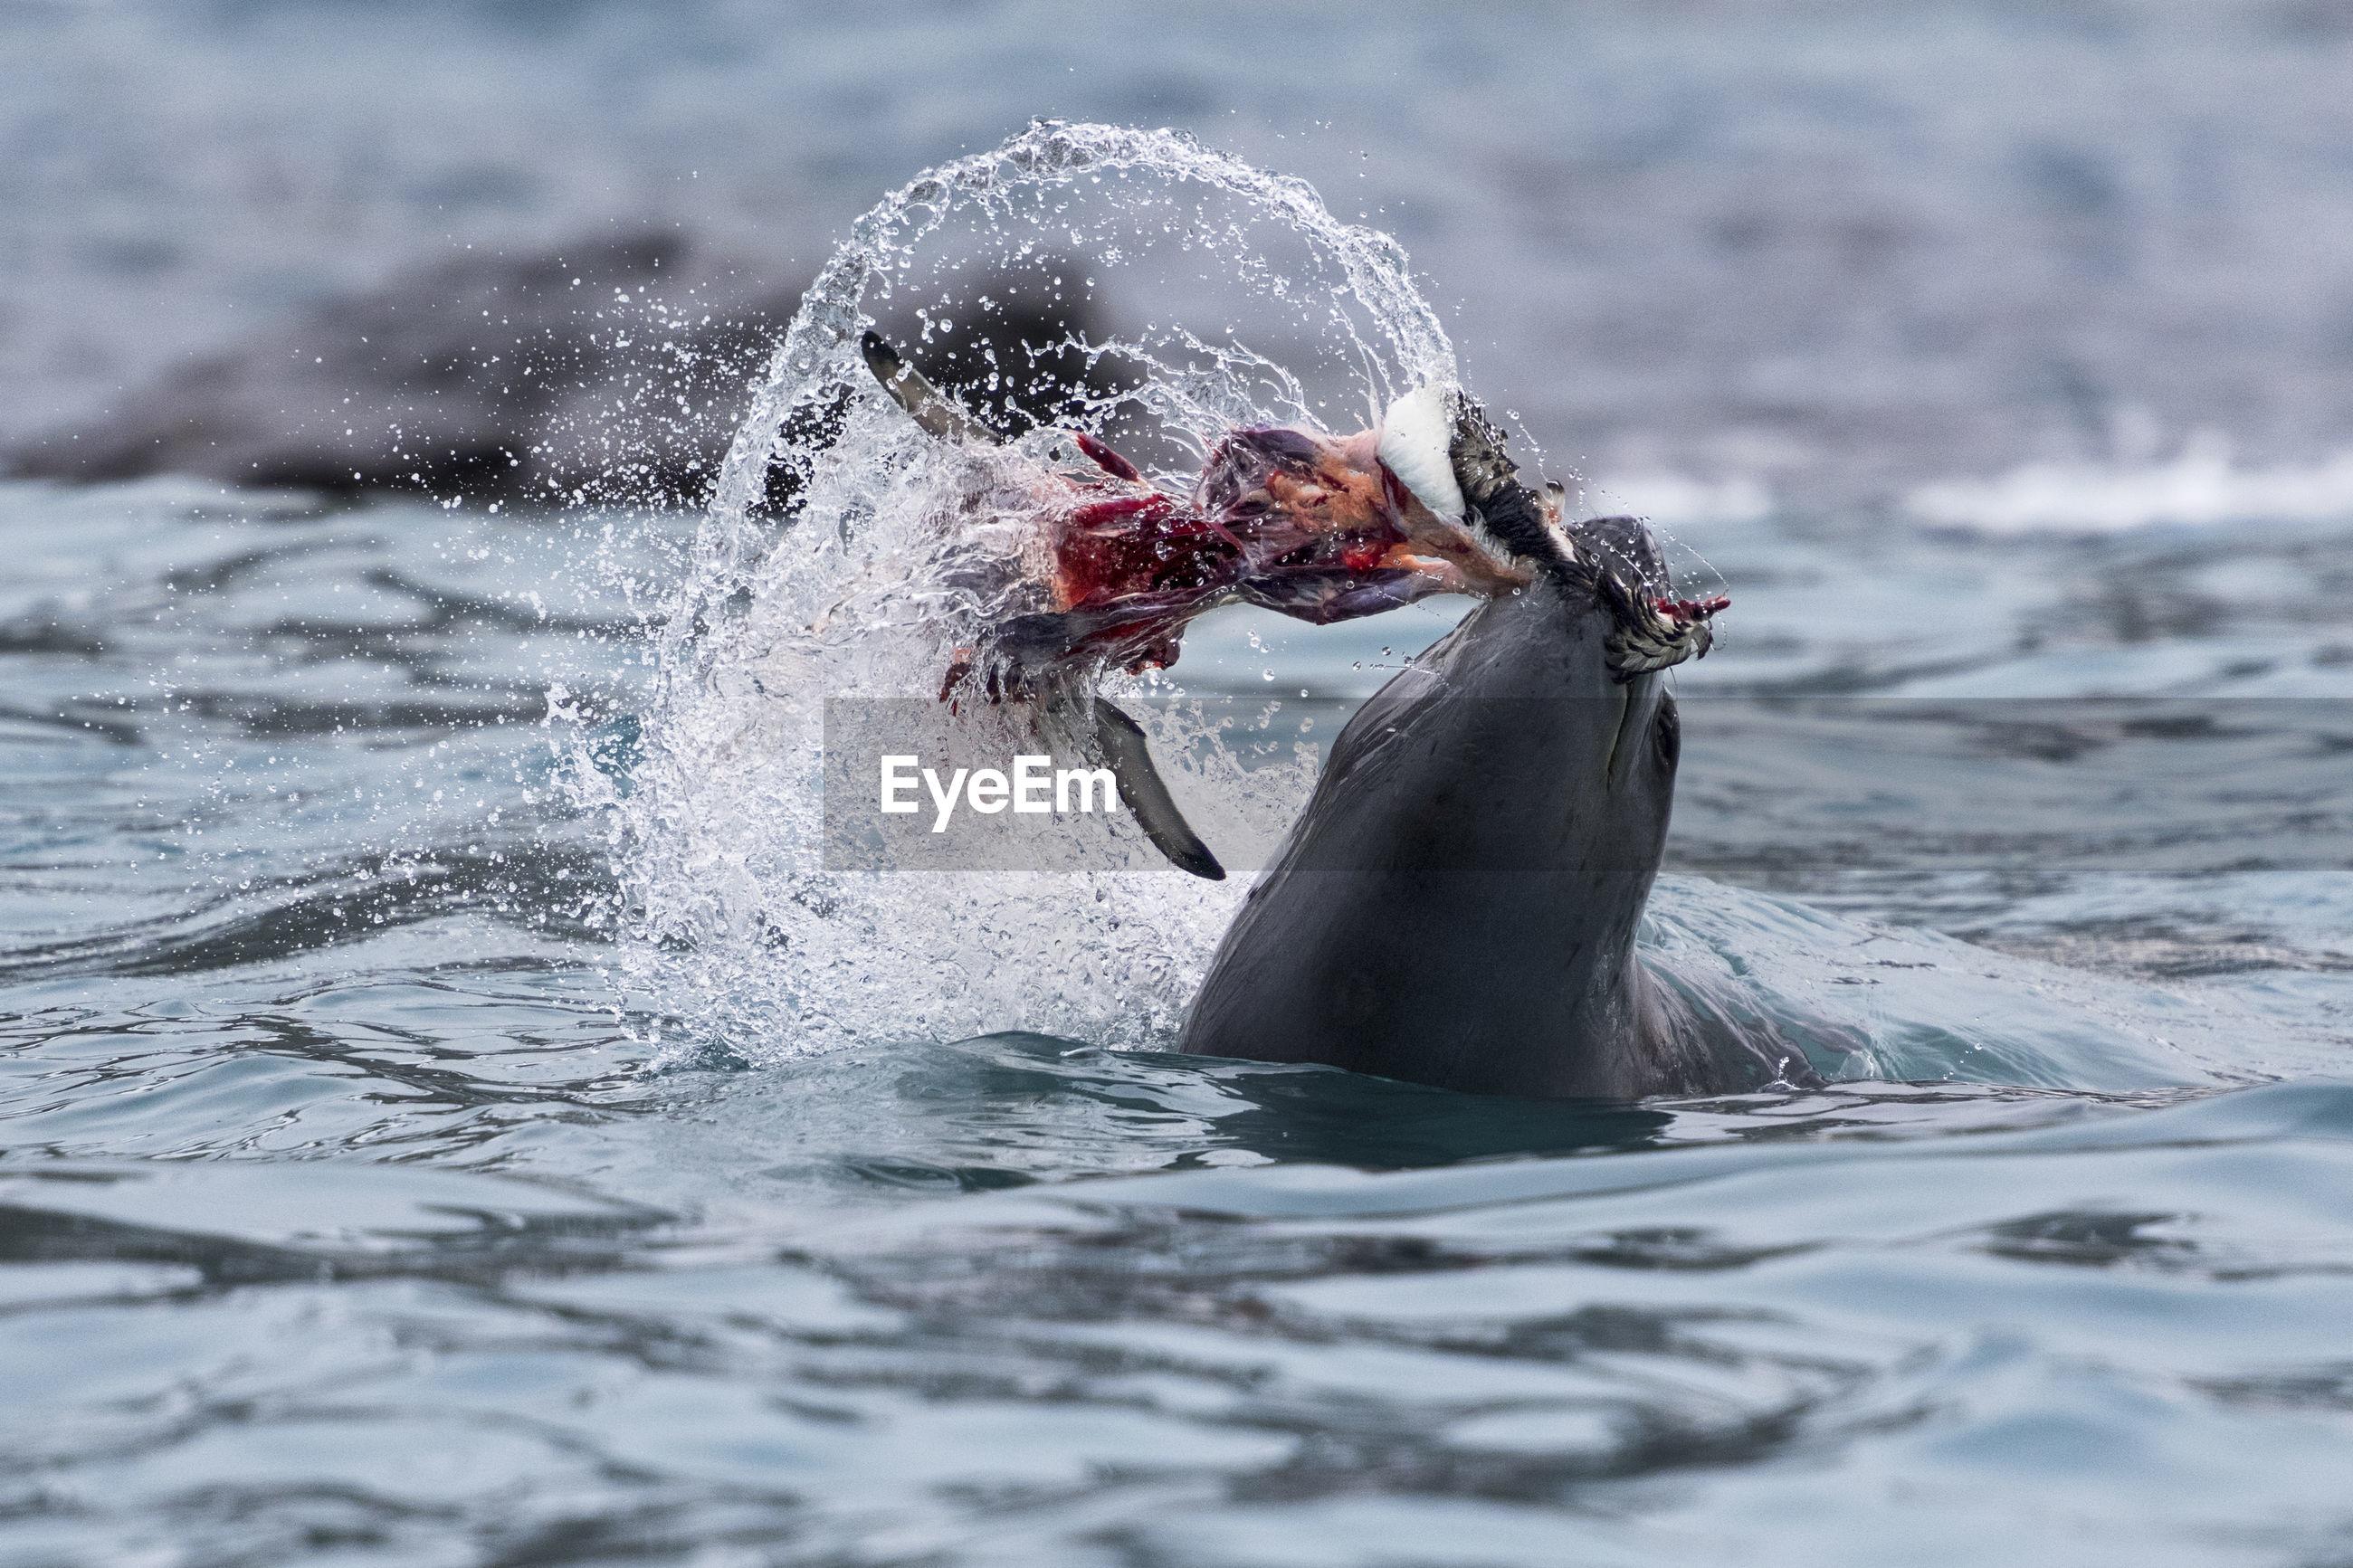 Elephant island, south shetlands, antarctica. leopard seal eating a penguin.